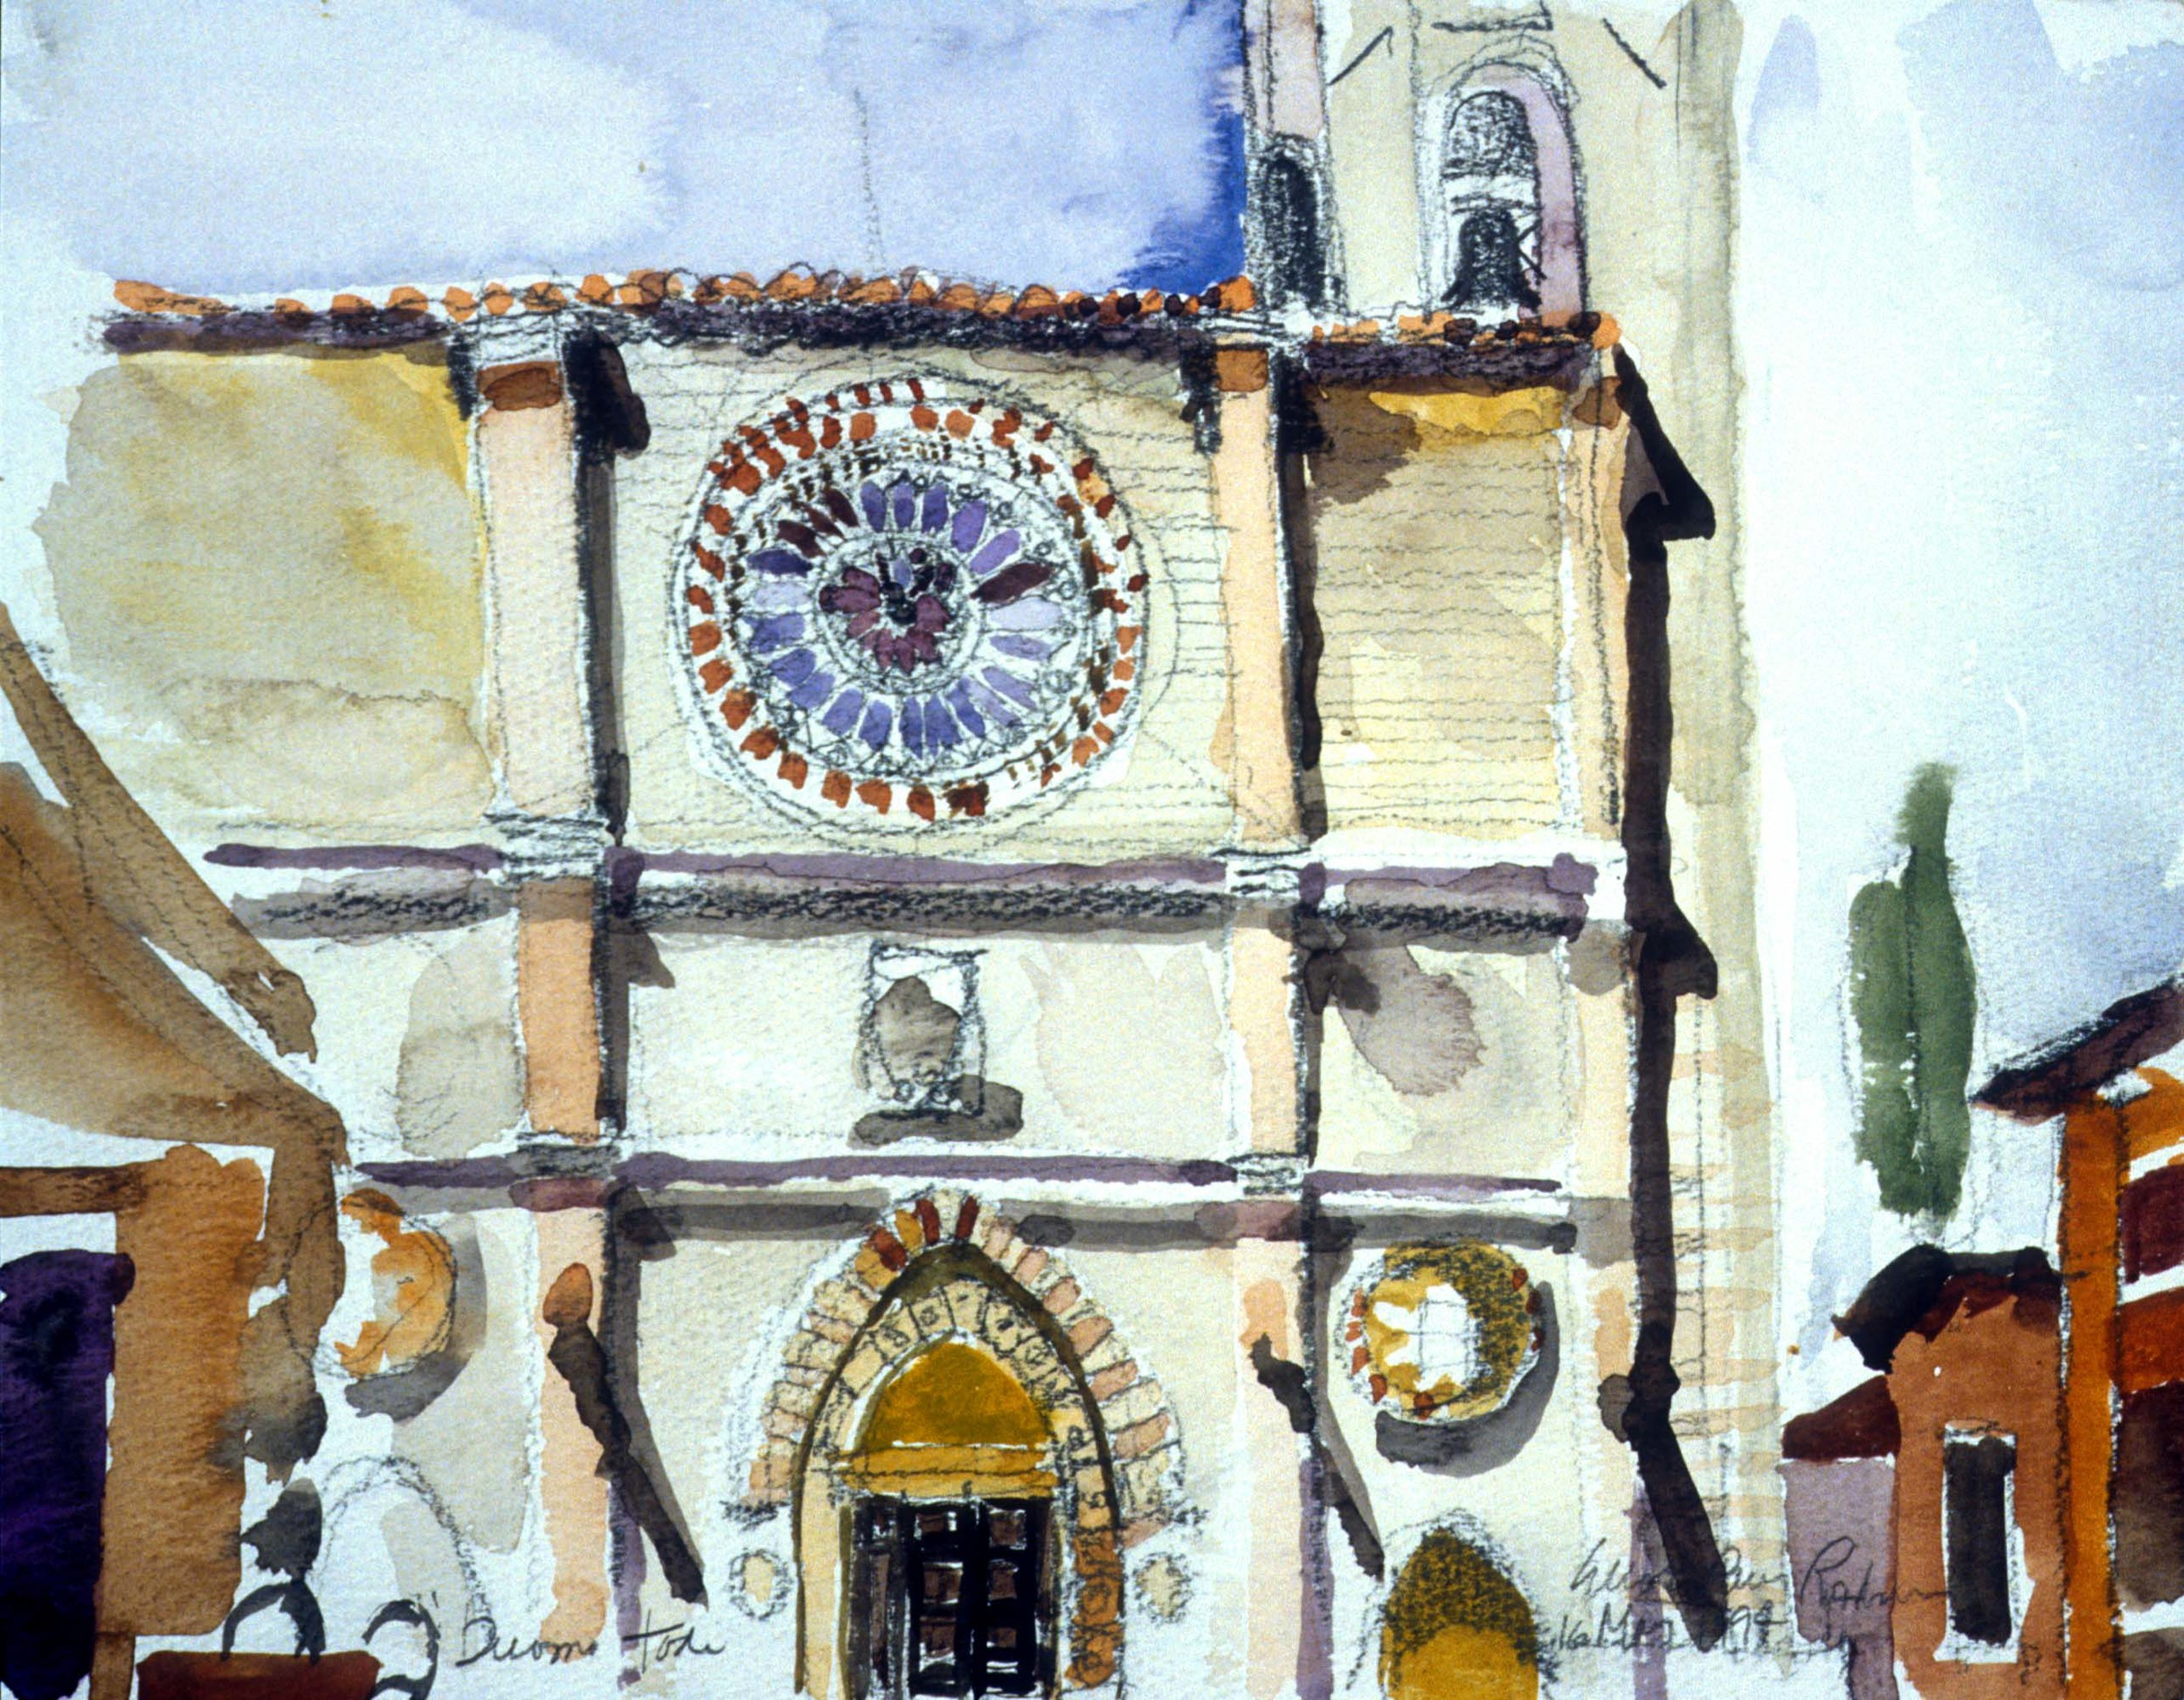 Duomo Todi